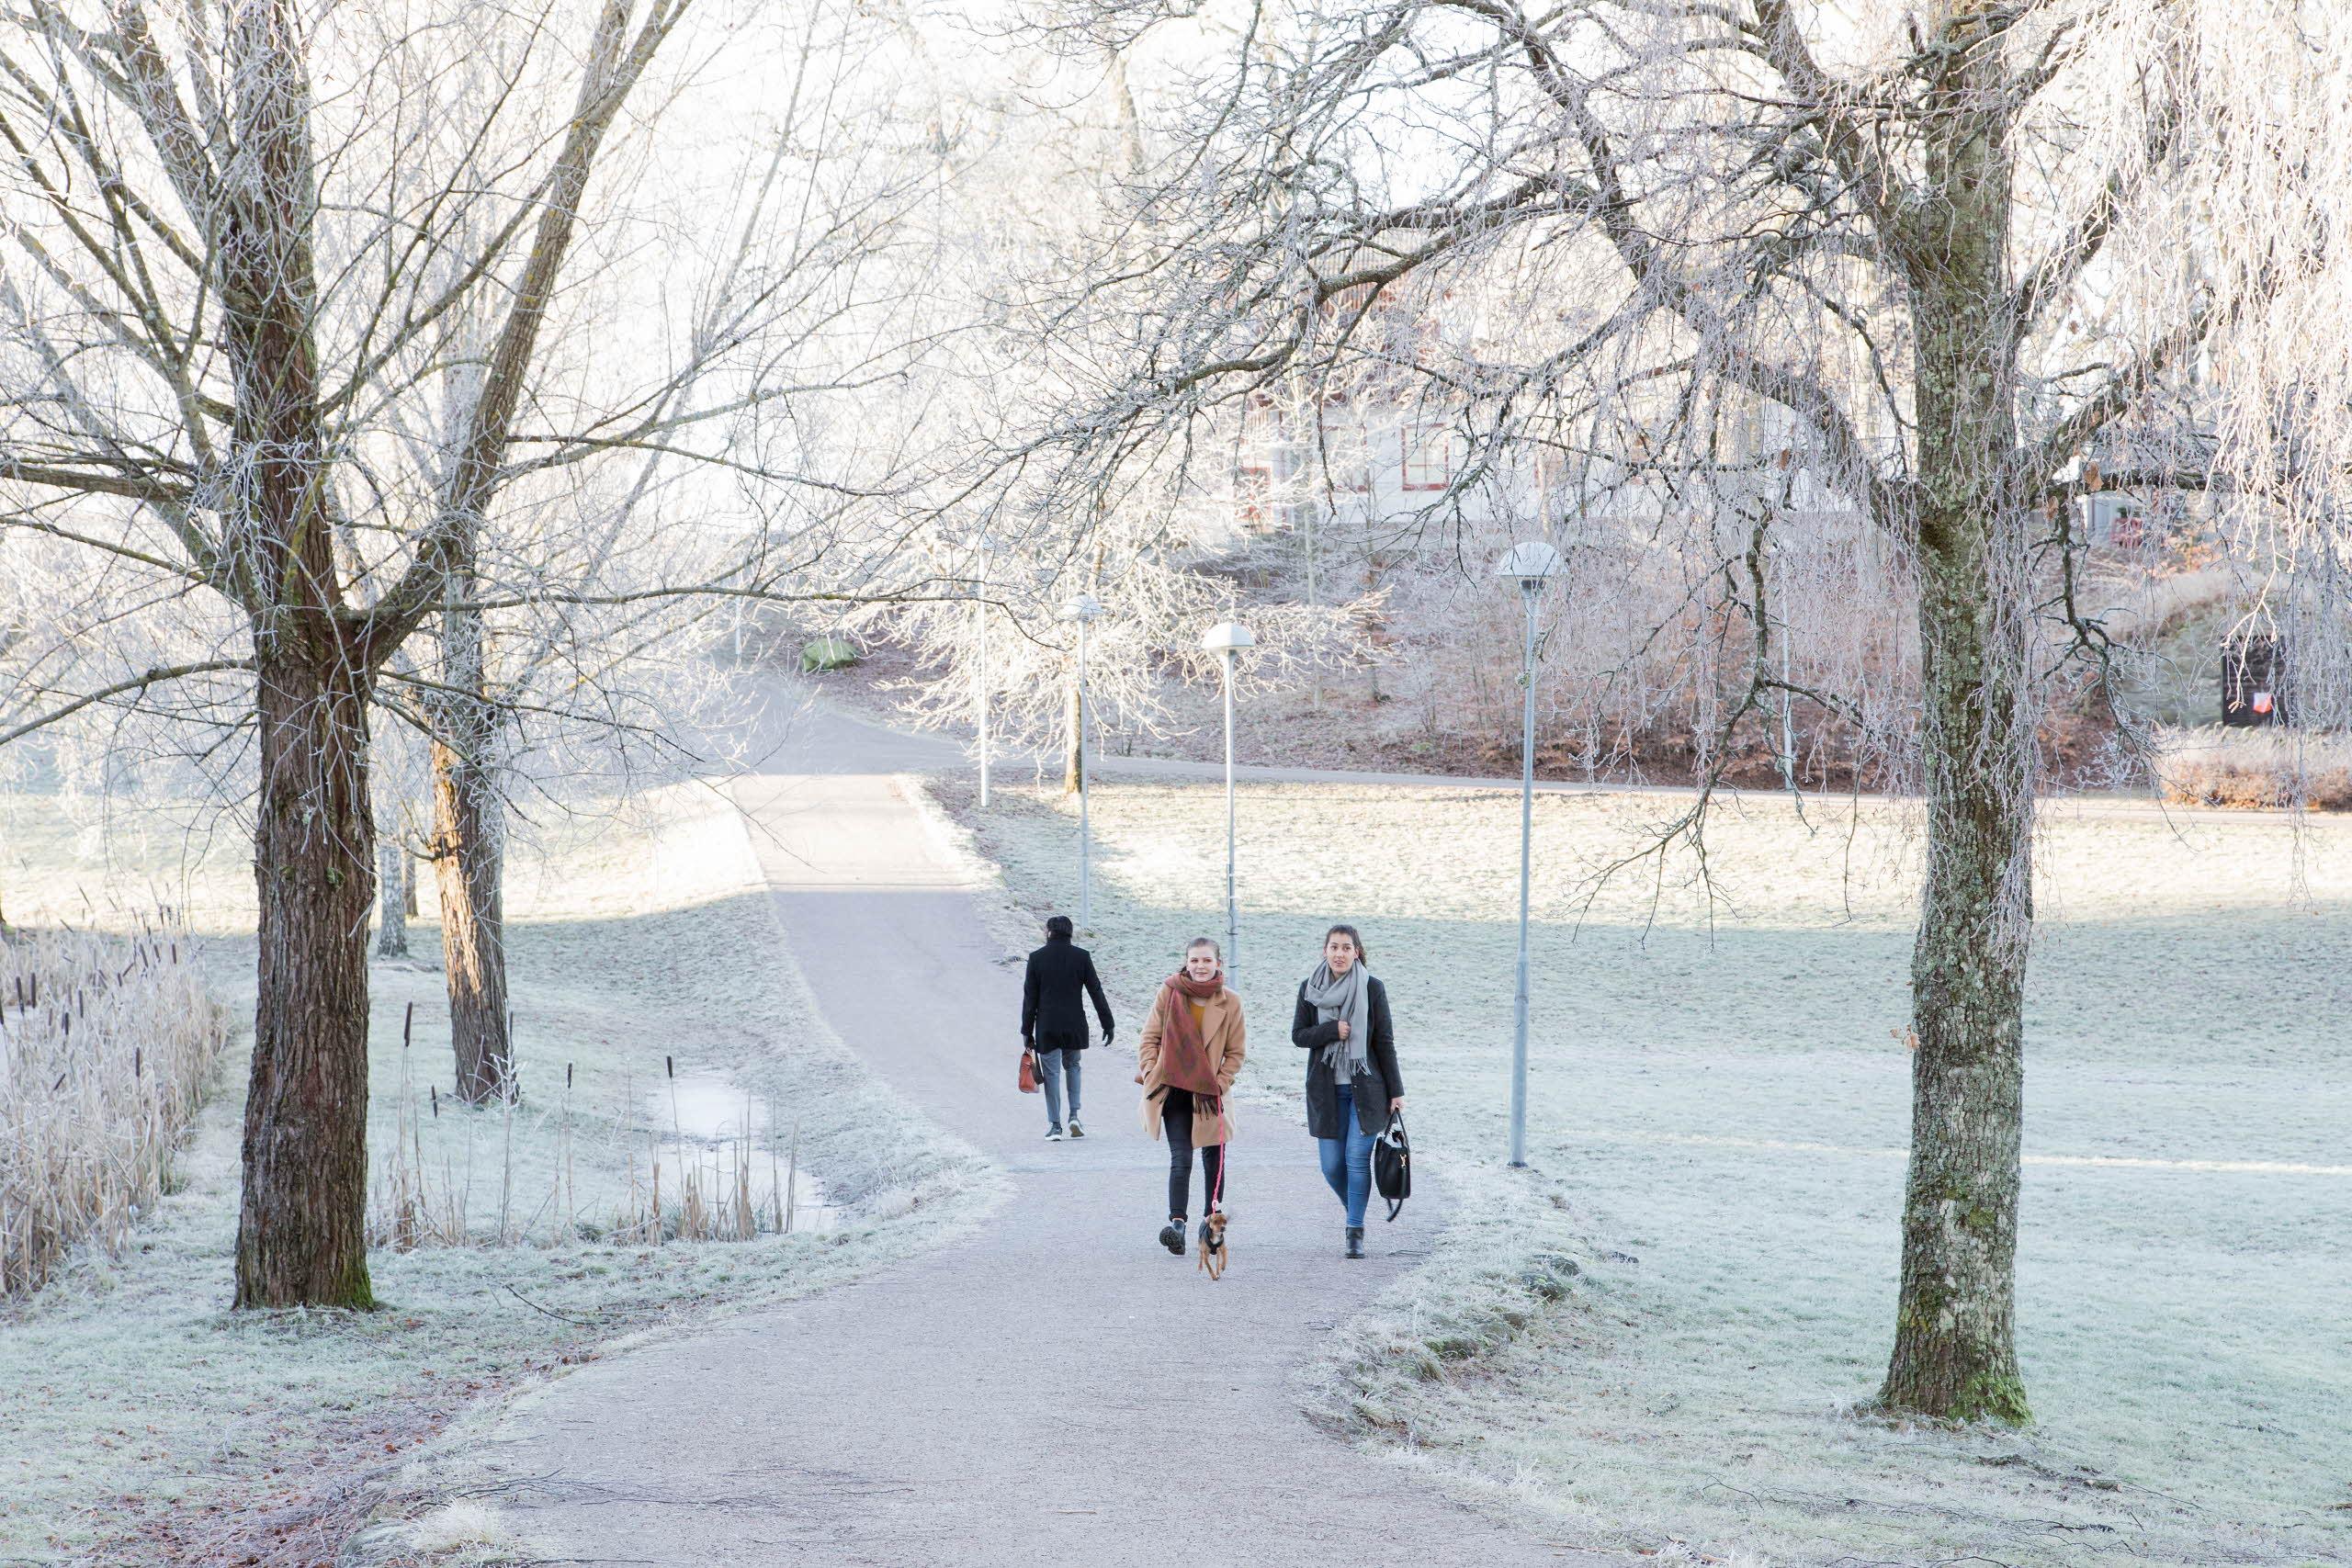 Winter day at at Linnaeus University